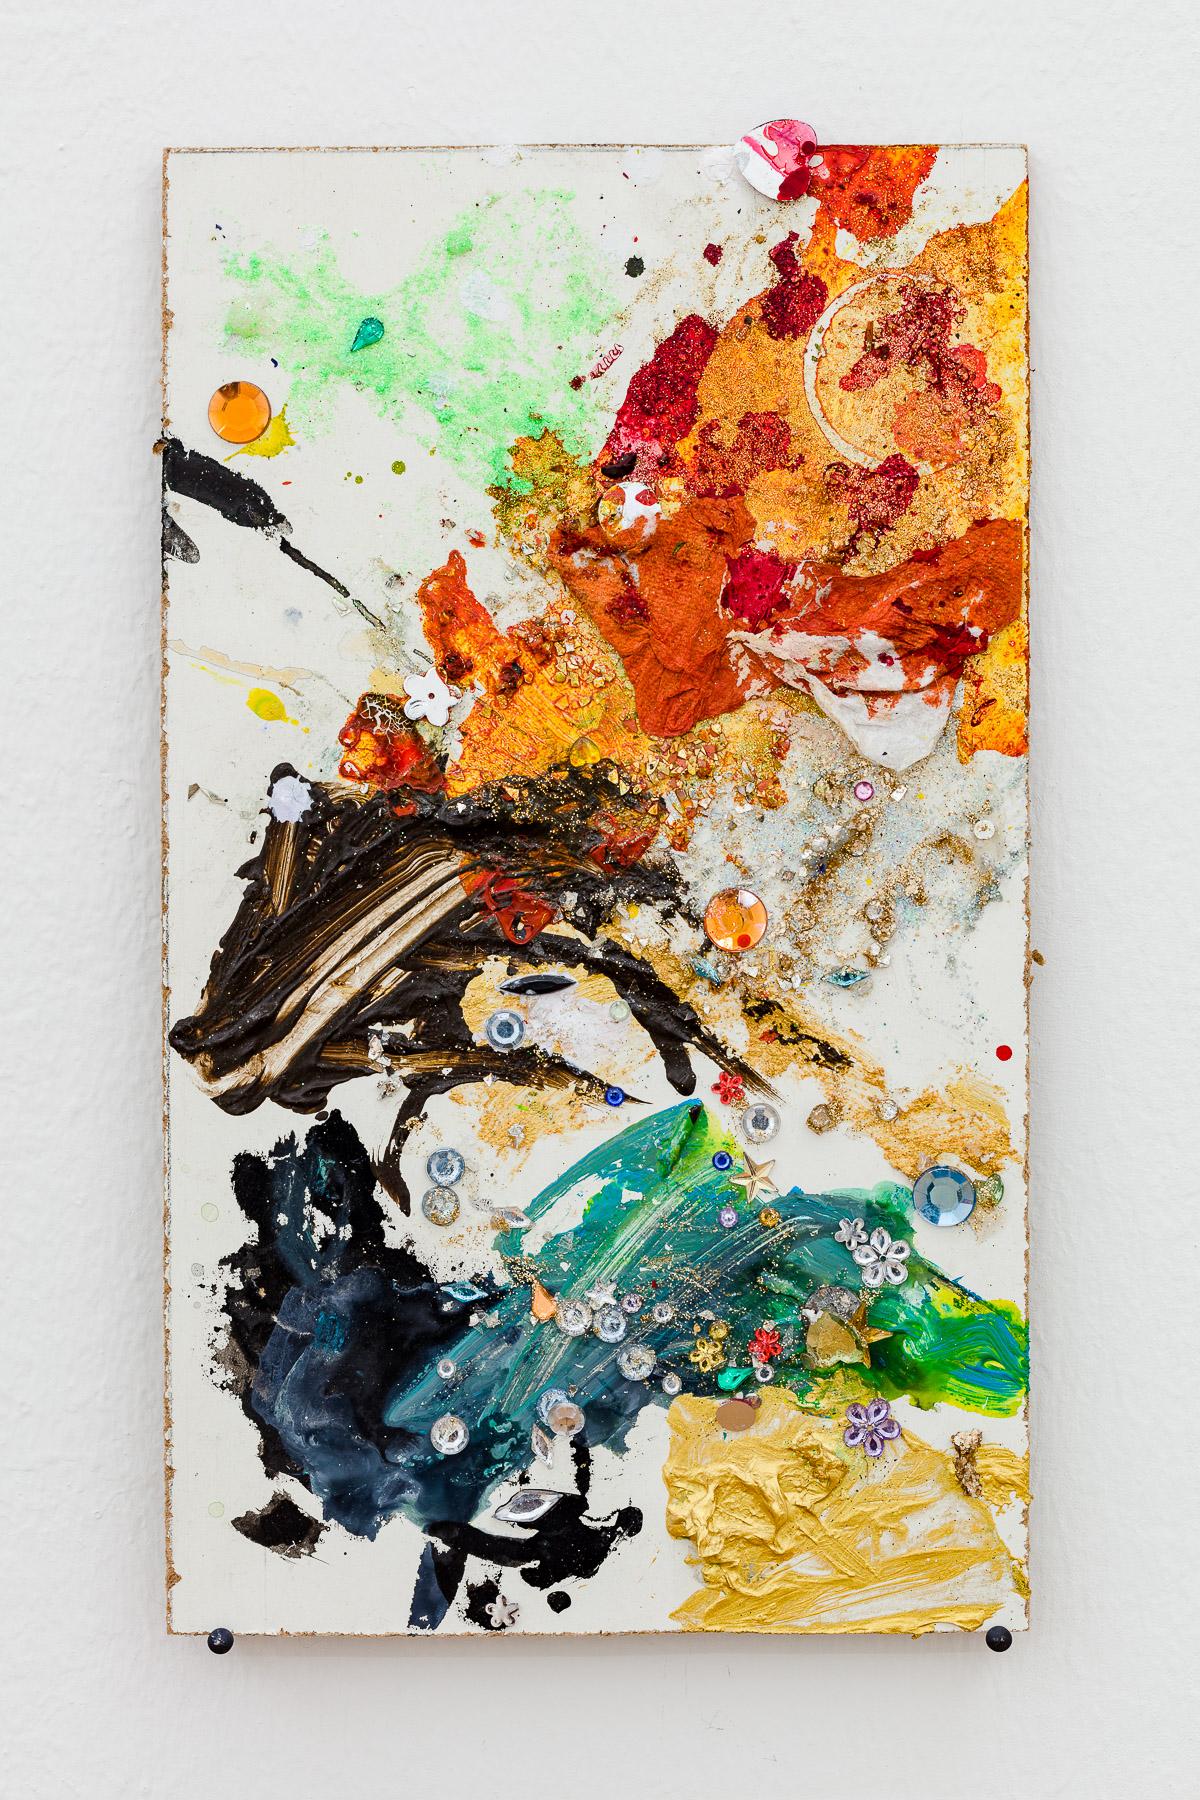 2019_05_20_Elke-Krystufek_Croy-Nielsen_by-kunst-dokumentation-com_020_web.jpg